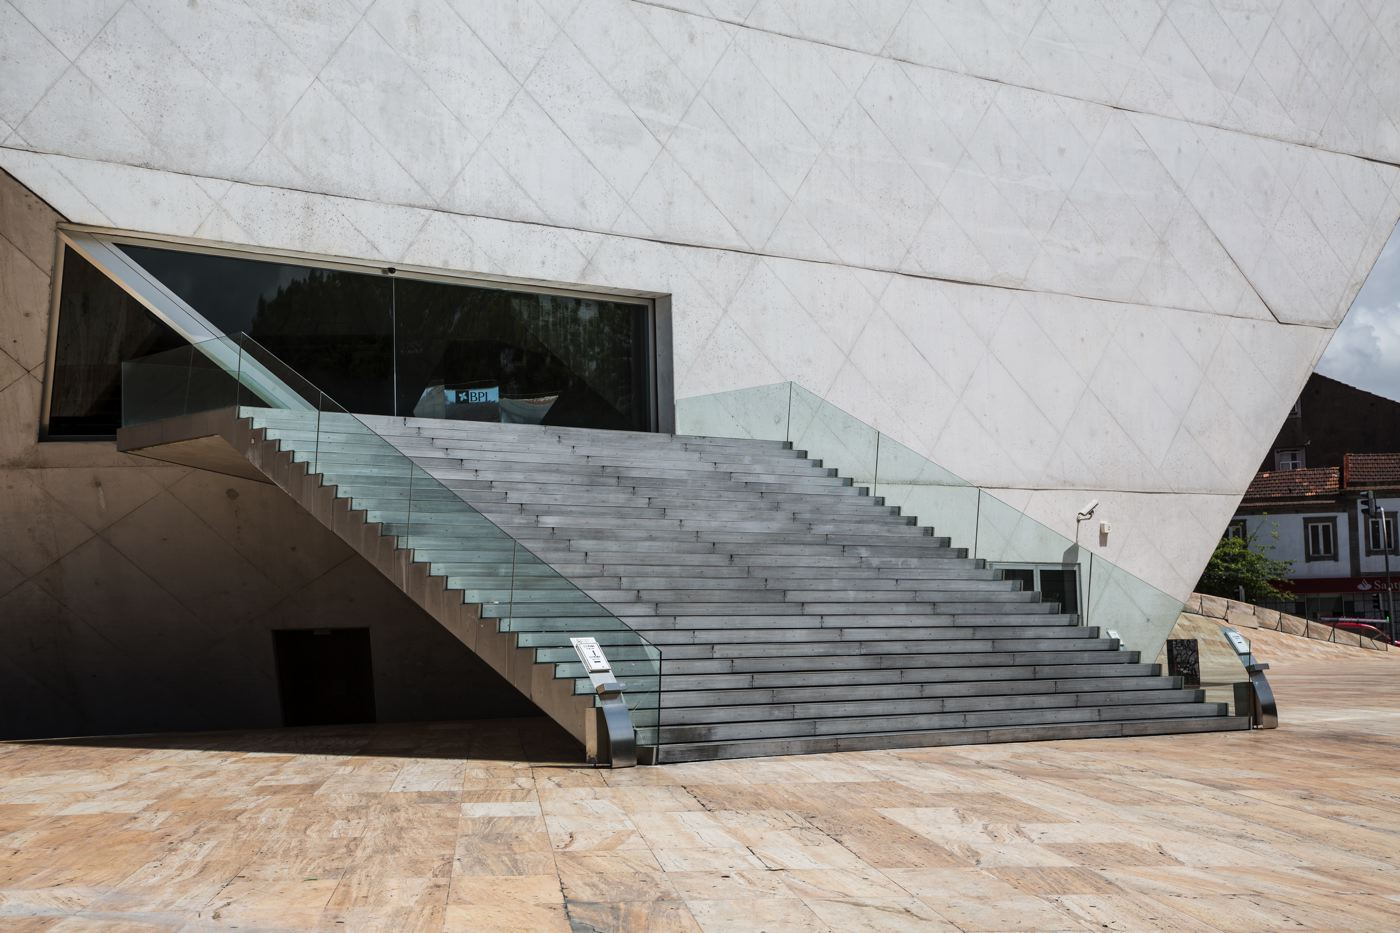 LDKphoto_PORTO-Casa da Musica-028.jpg